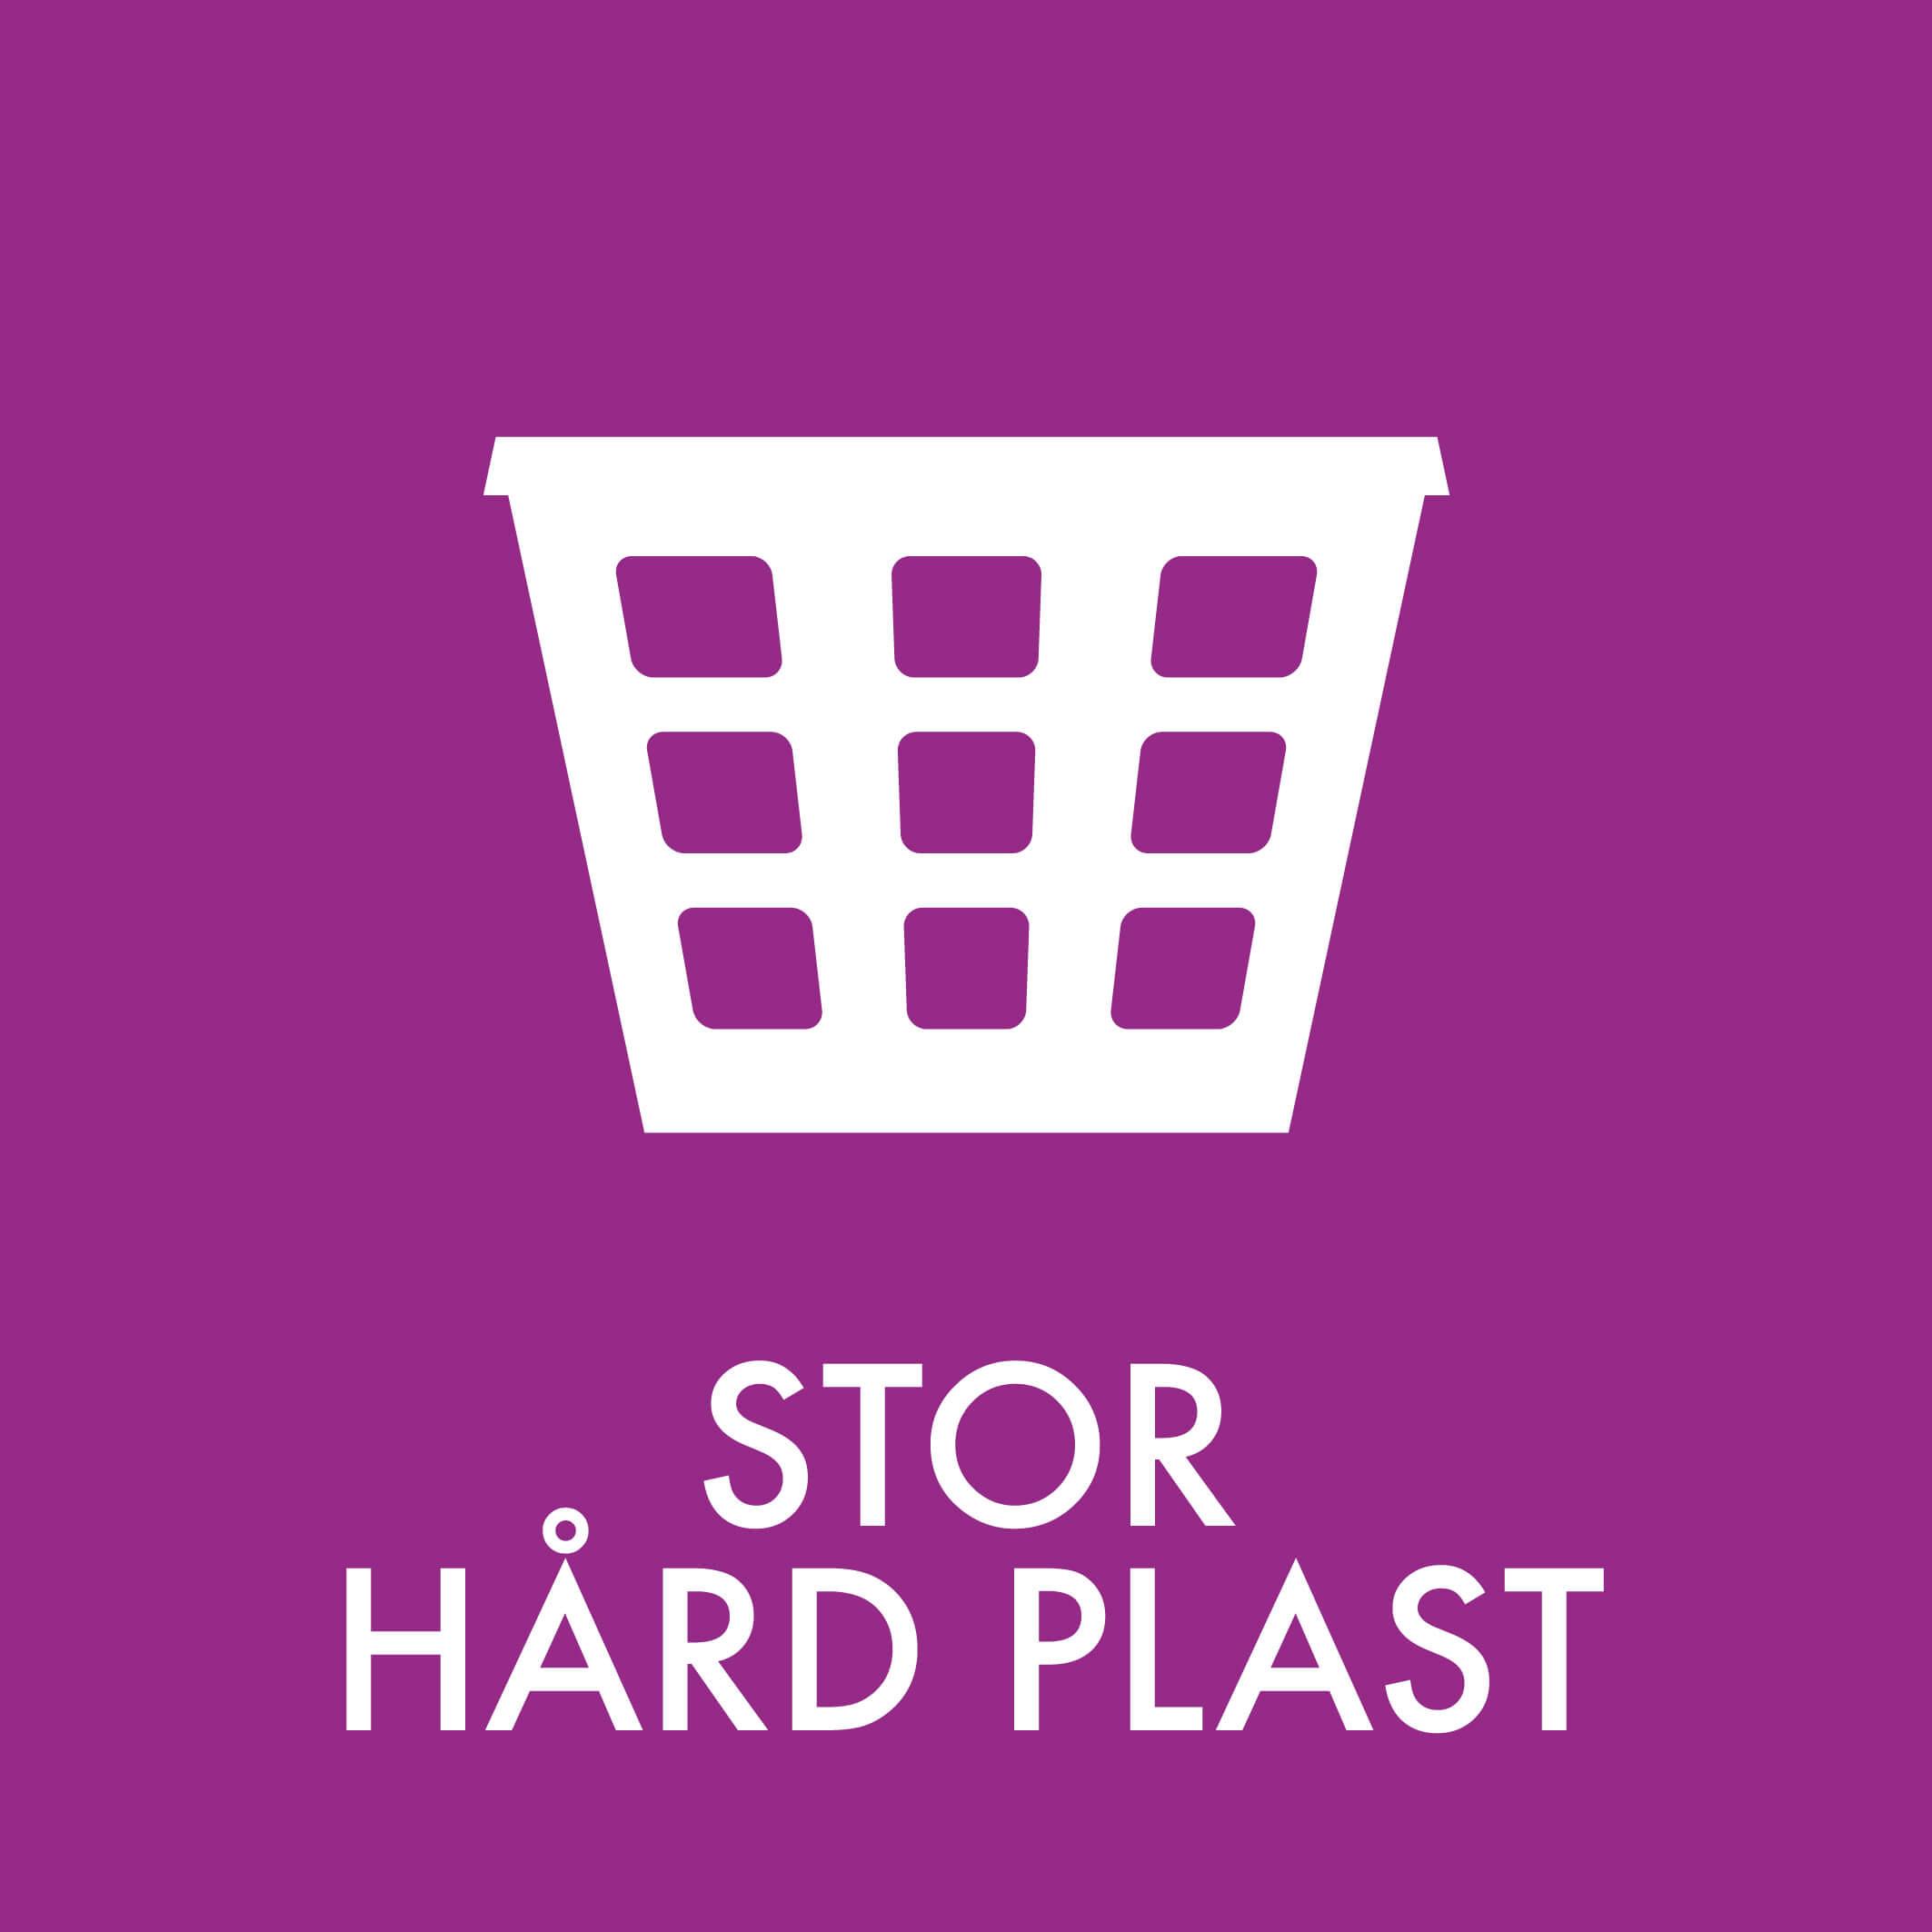 Dansk Affaldssortering - Stor hård plast